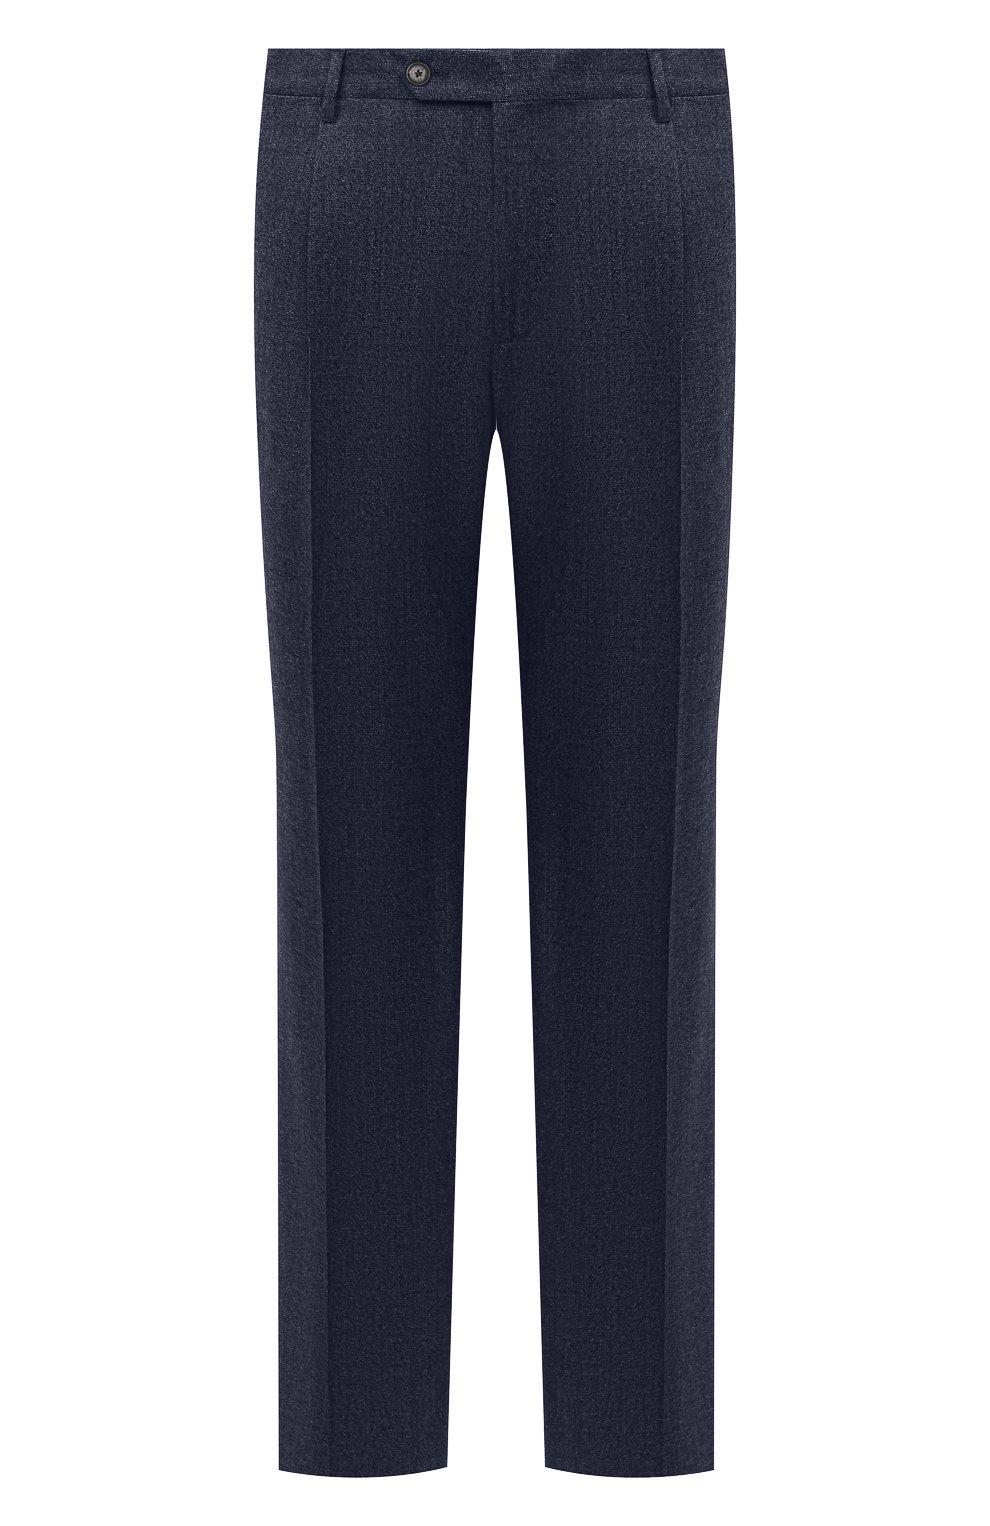 Мужские шерстяные брюки LUCIANO BARBERA темно-синего цвета, арт. 104136/25233/58-62   Фото 1